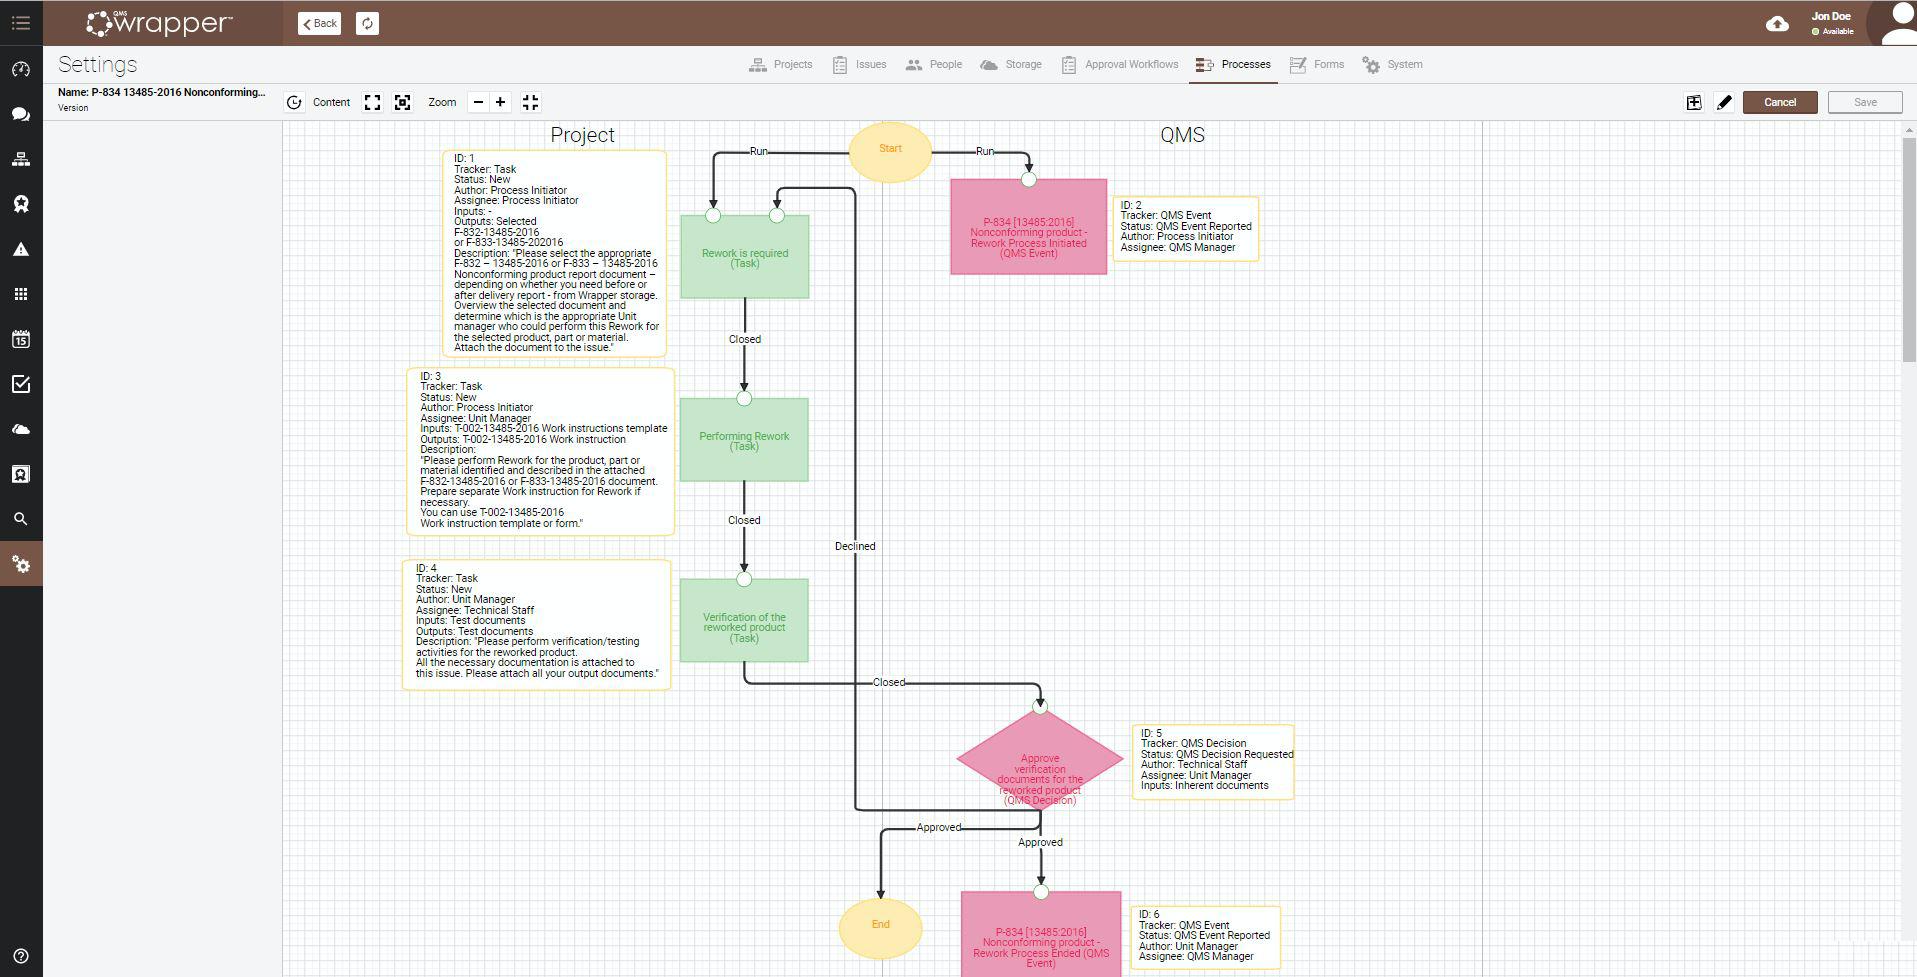 qmsWrapper screenshot: Process Framework